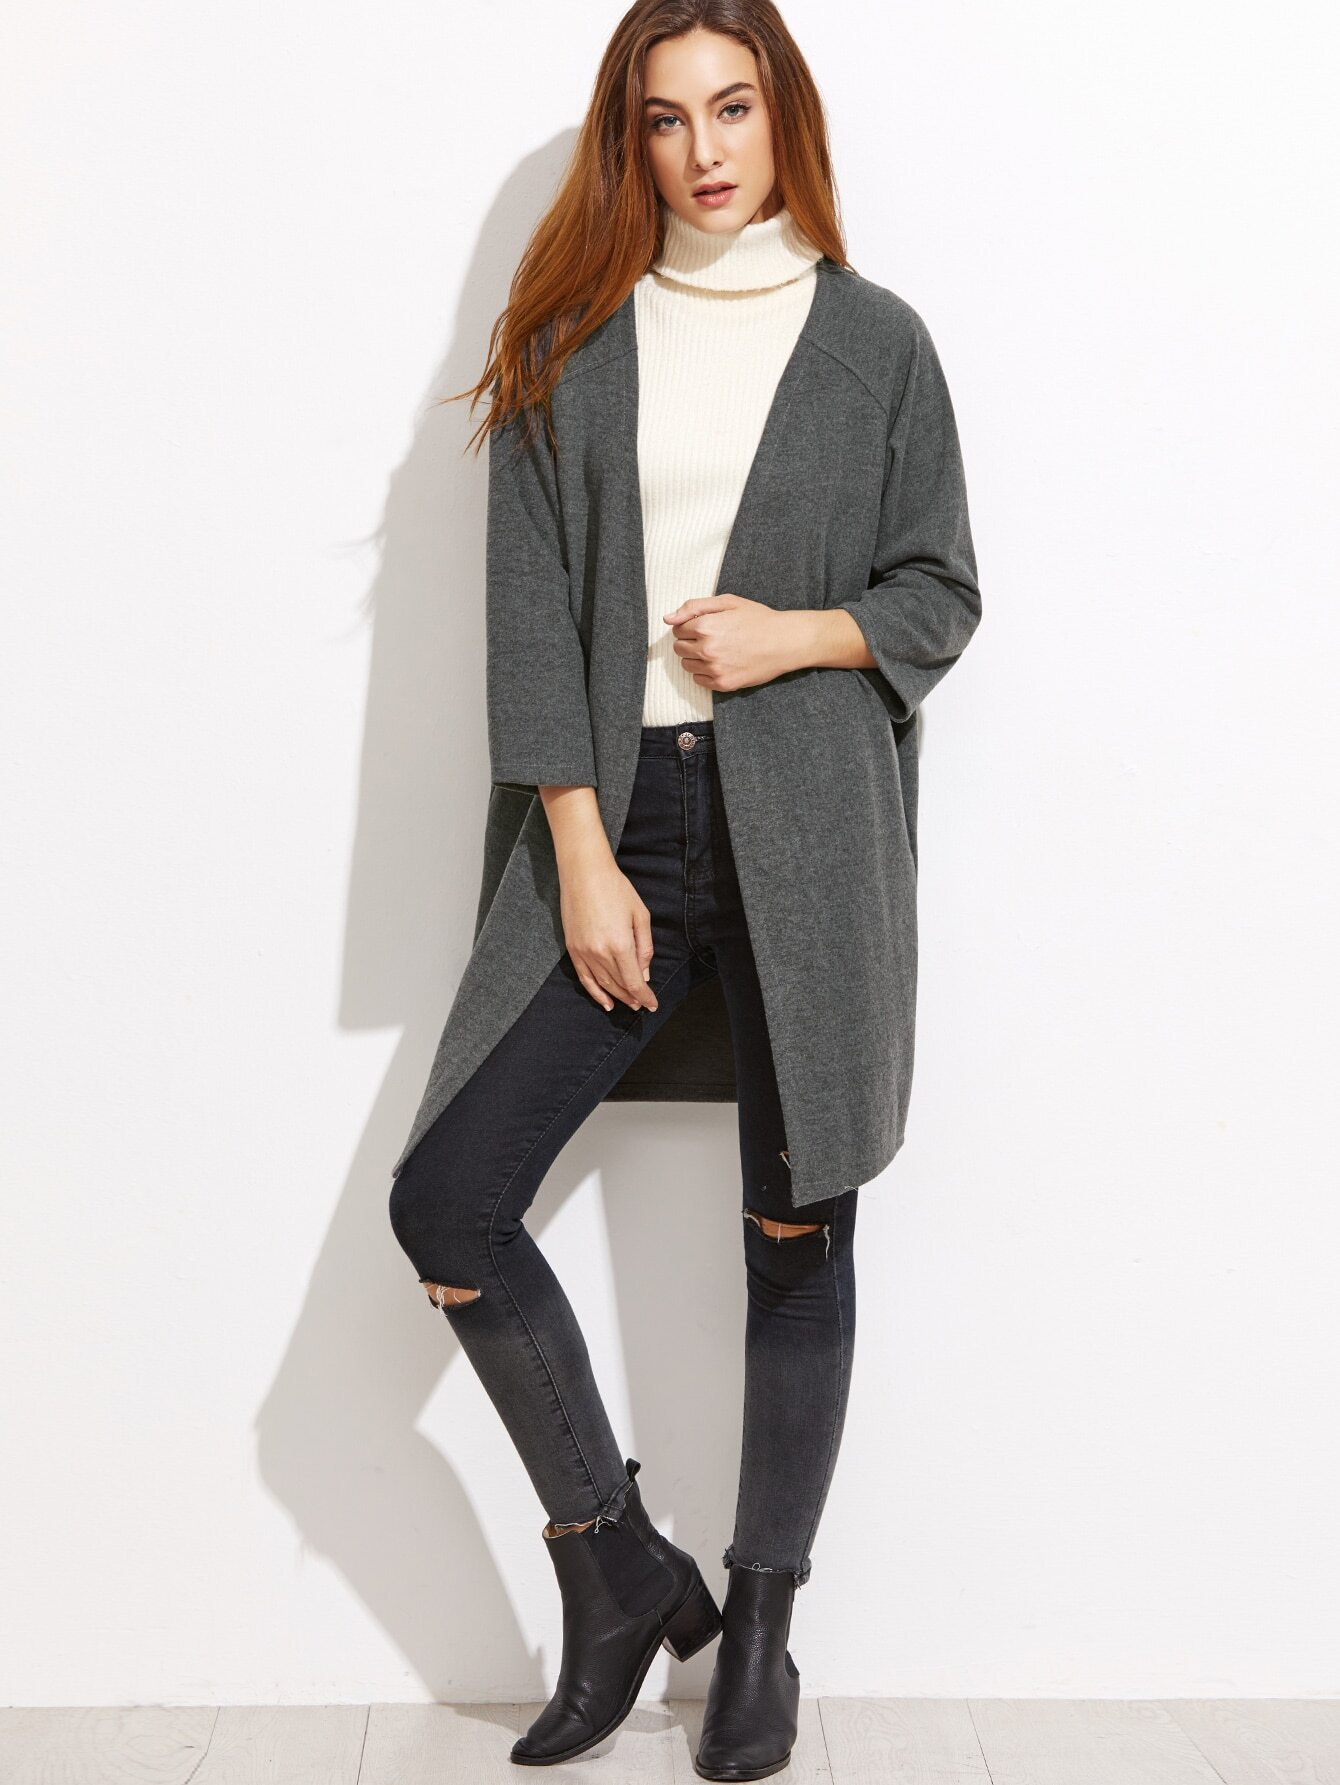 Dark Grey Raglan Sleeve CoatDark Grey Raglan Sleeve Coat<br><br>color: Grey<br>size: one-size